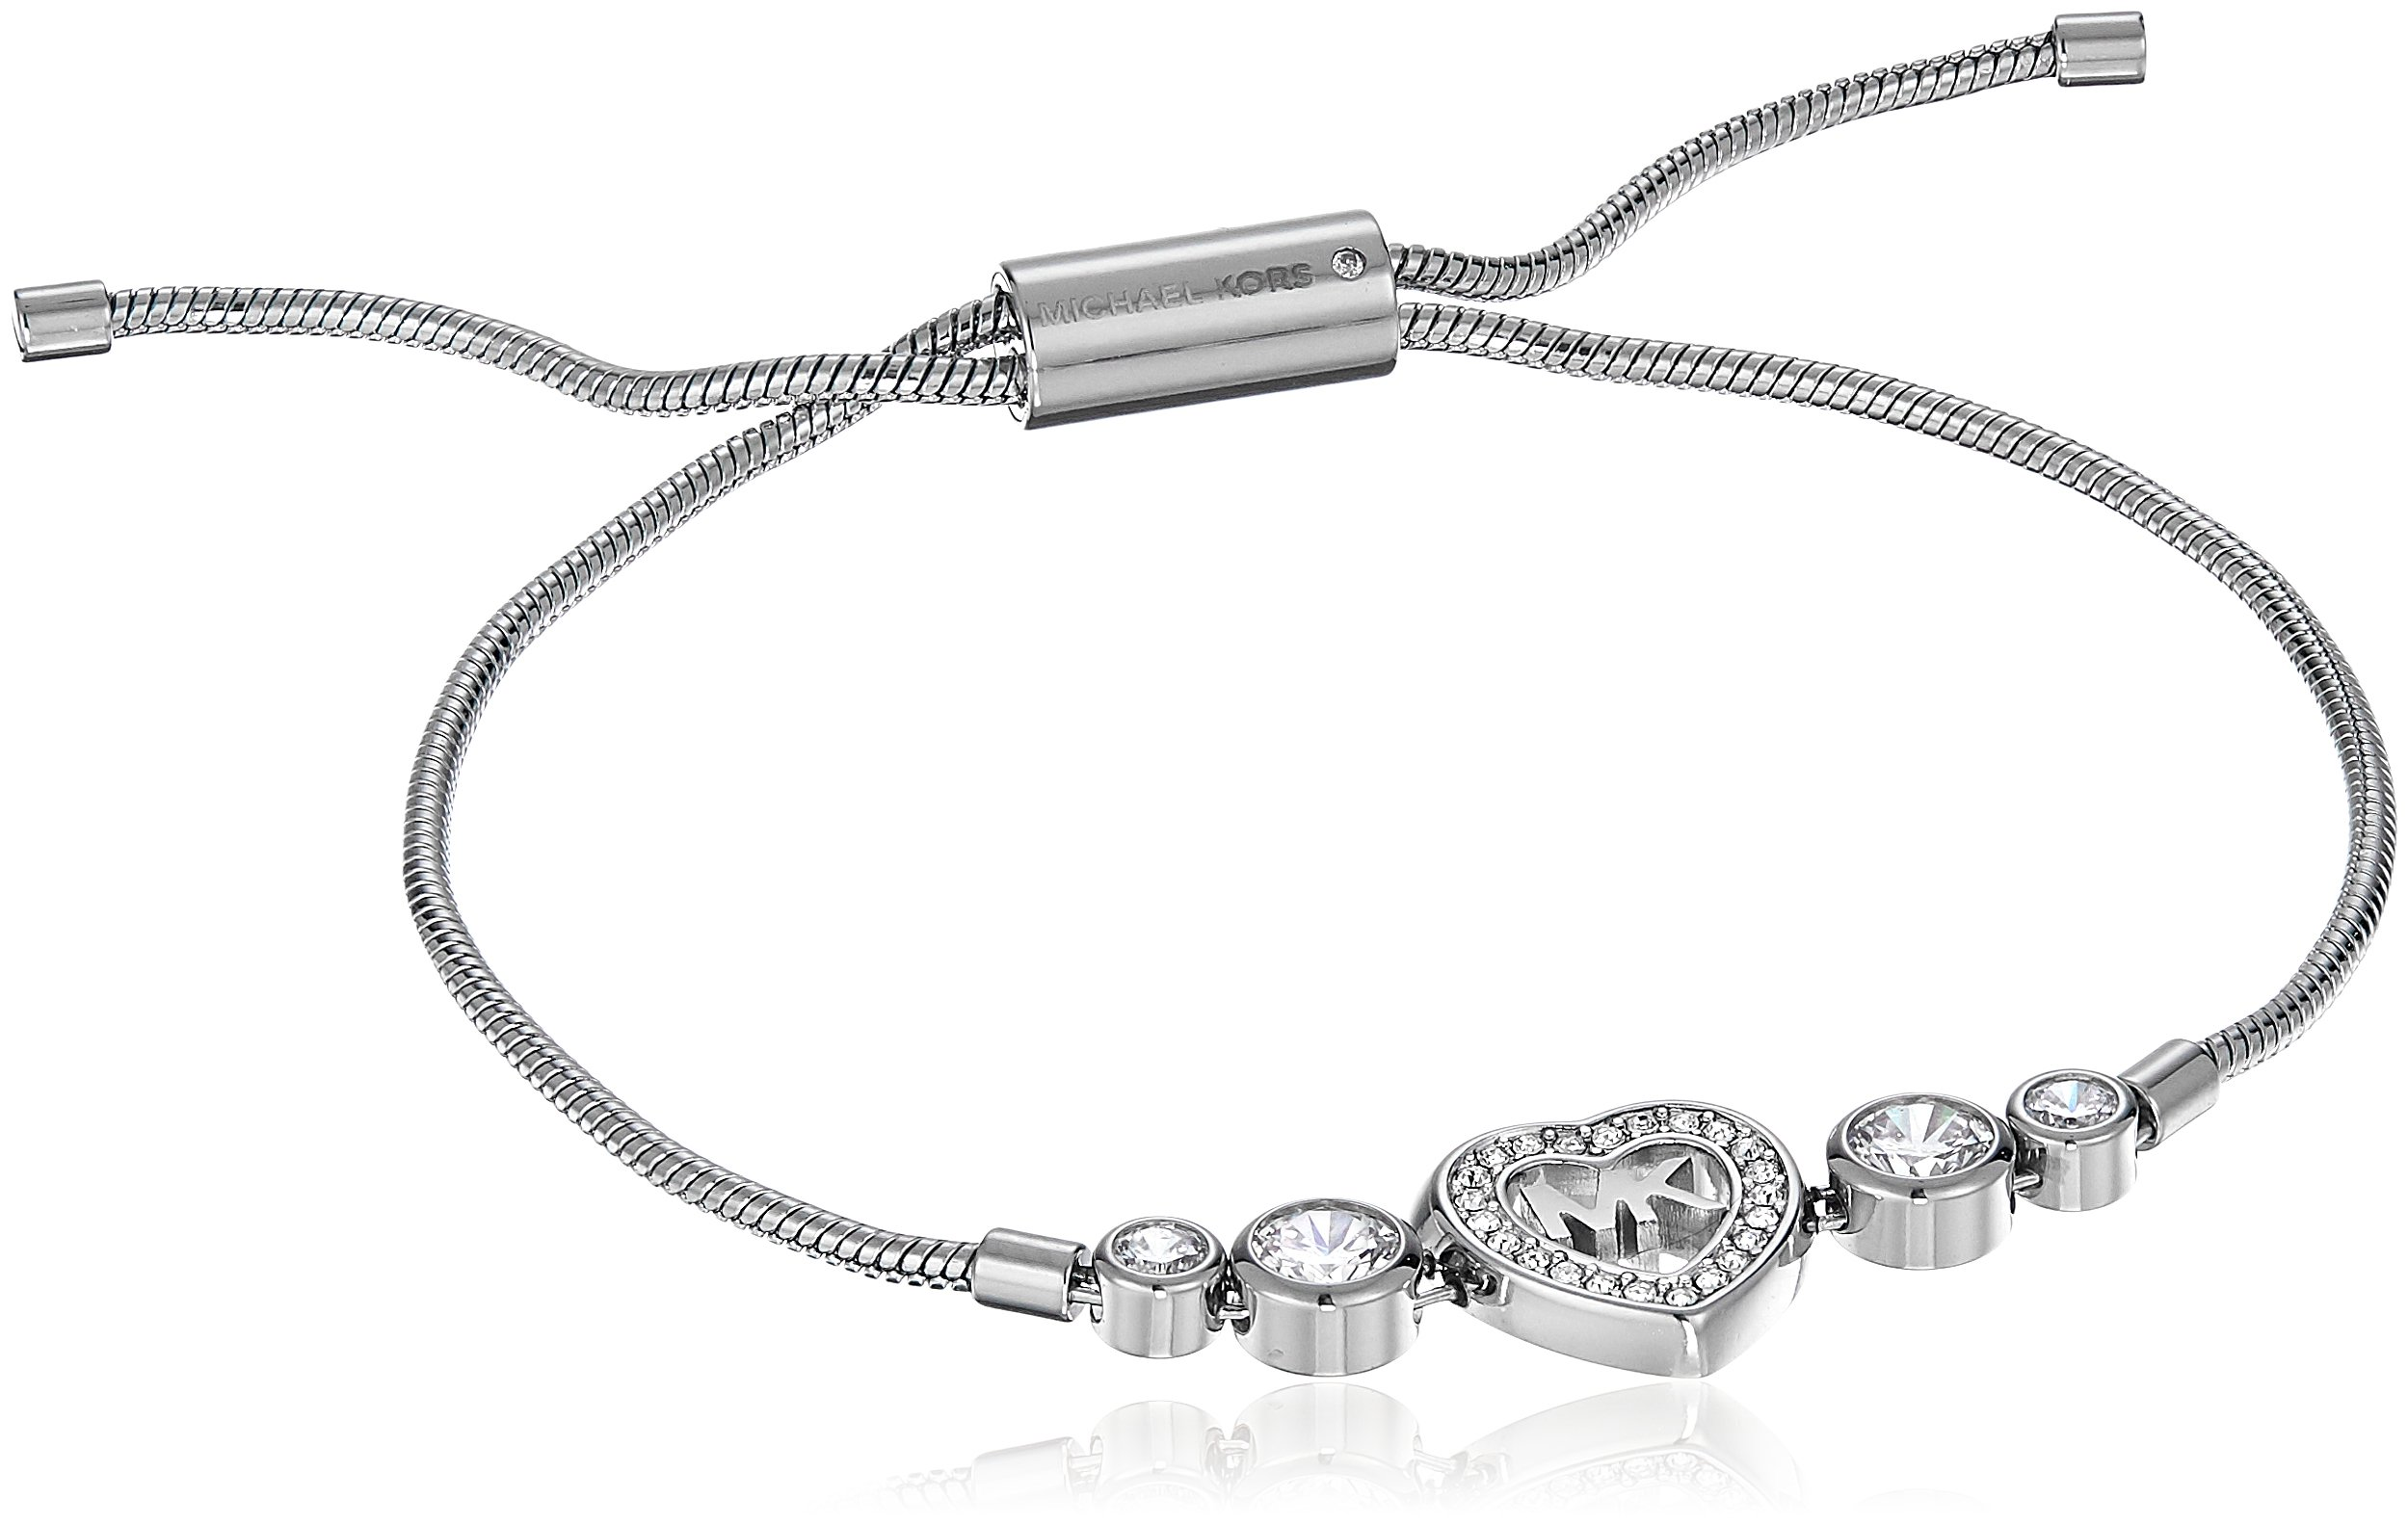 Michael Kors Womens Silver-Tone Heart Link Charm Bracelet, One Size